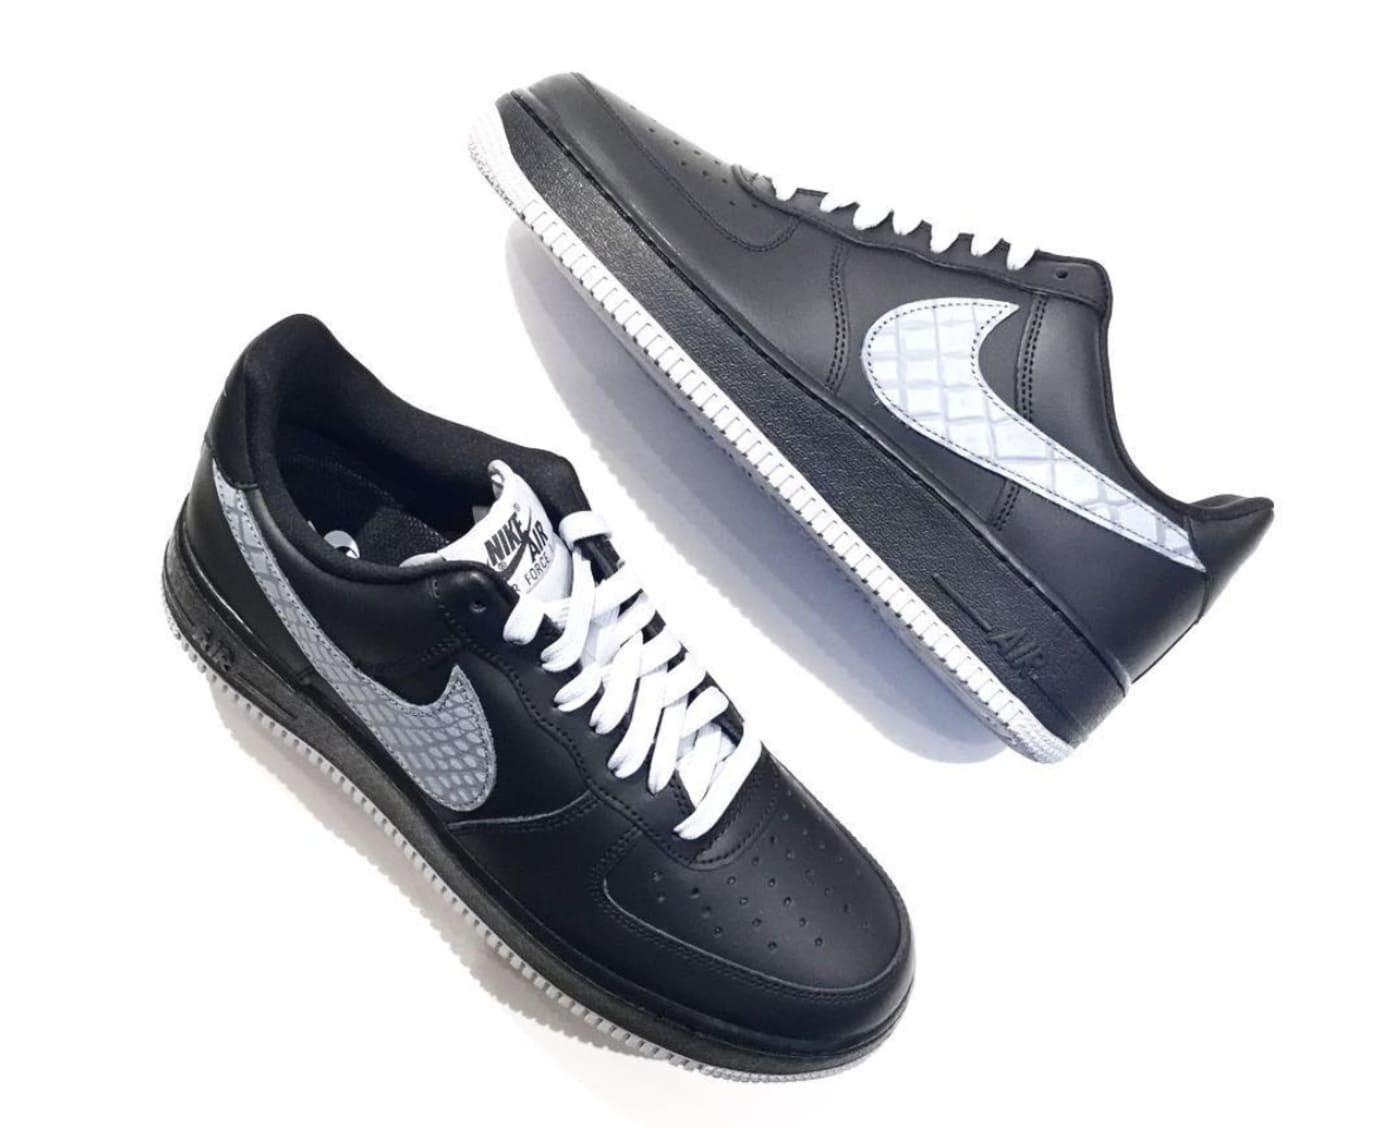 Nike Air Force 1 '07 LV8 Black/Sail 823511-012 (Pair)